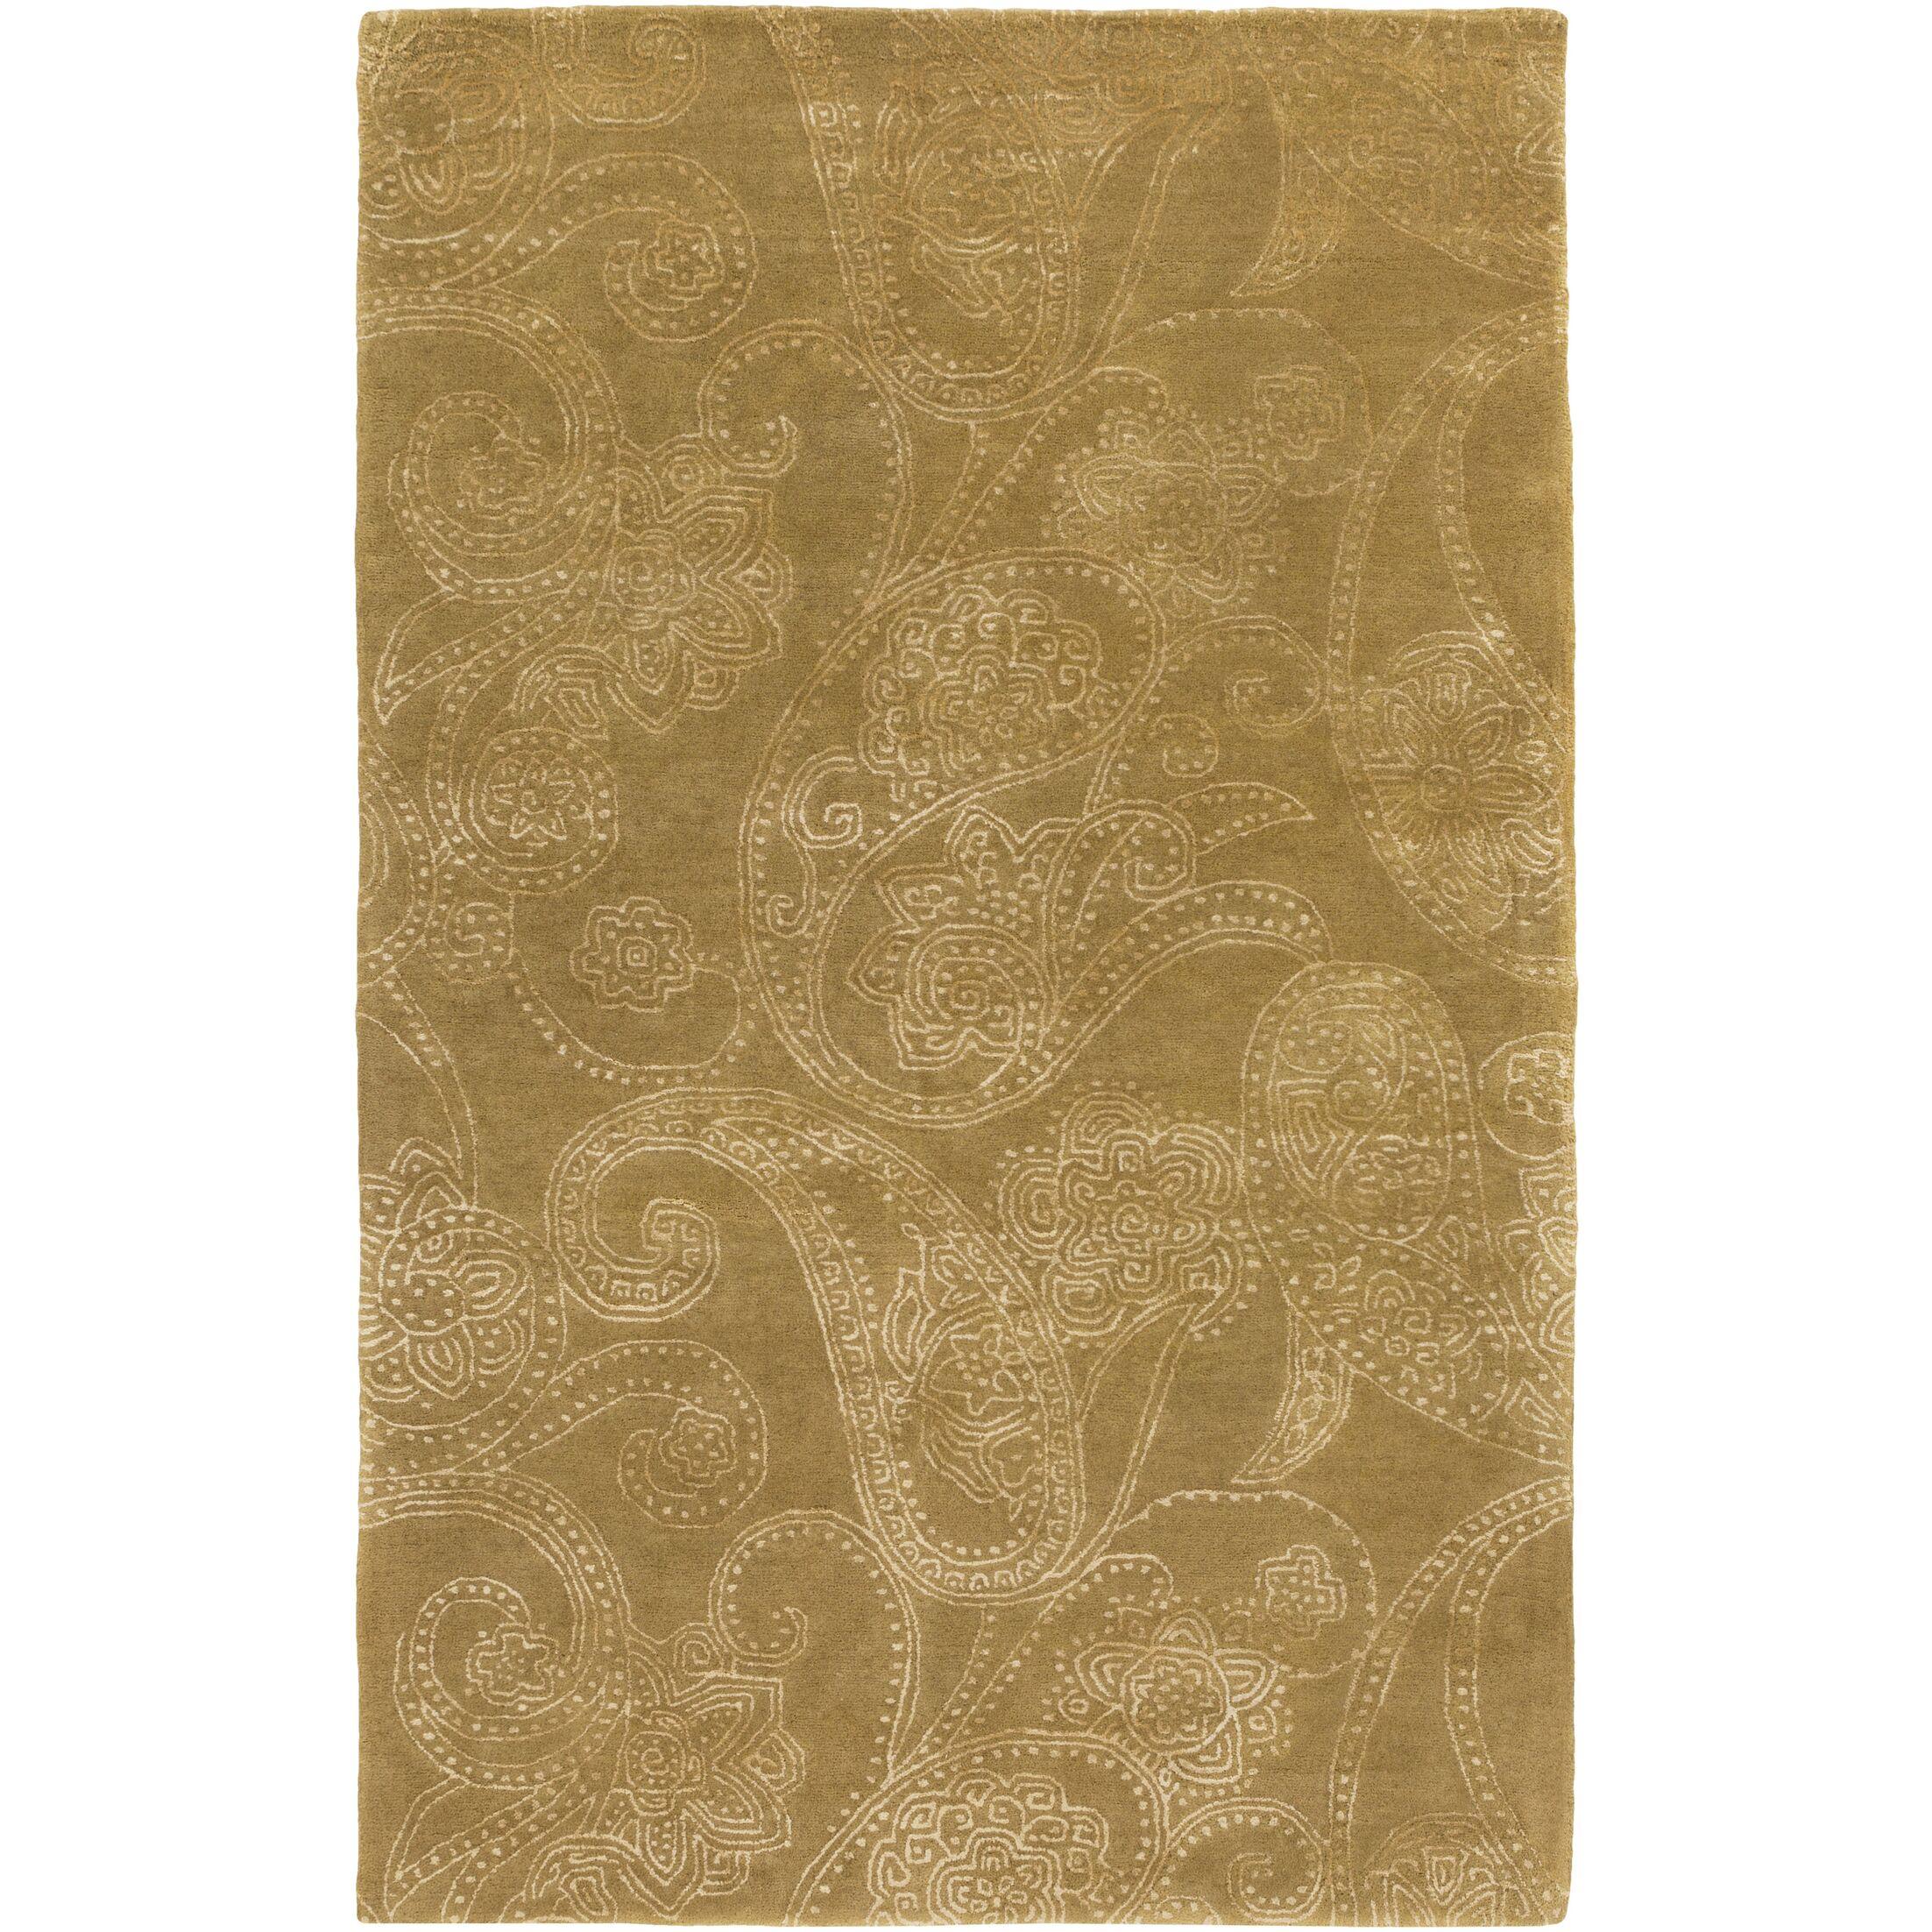 Laurita Hand-Tufted Tan/White Area Rug Rug Size: Rectangle 3'3